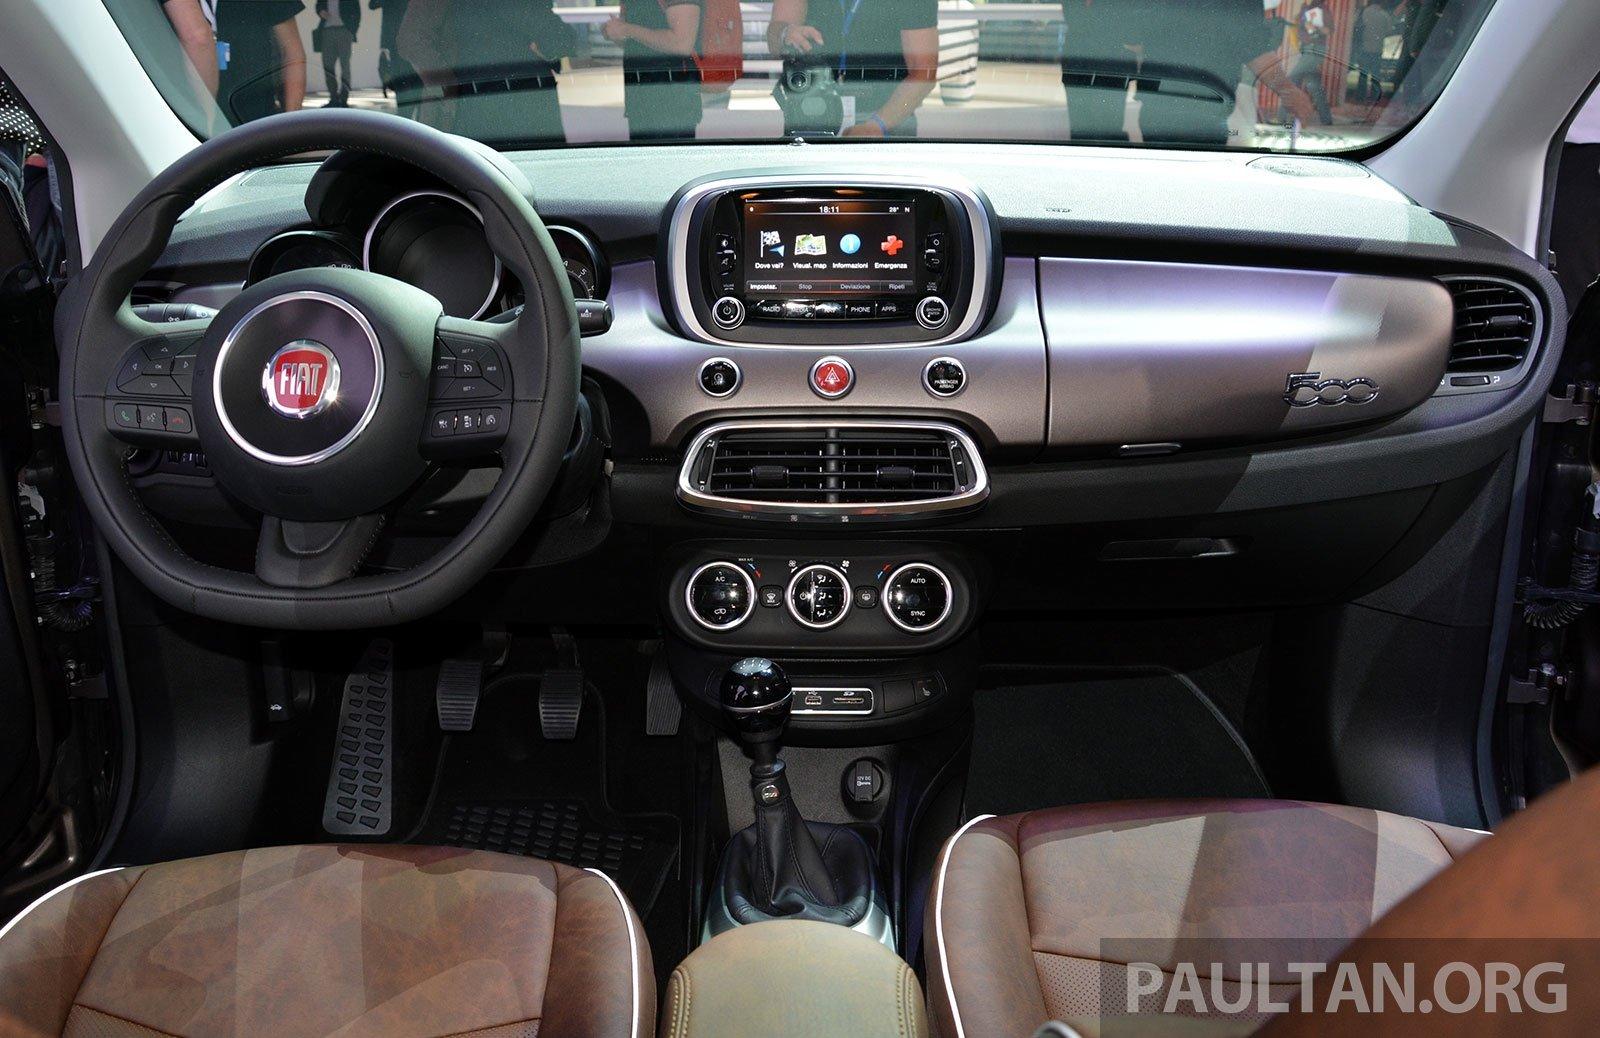 http://s2.paultan.org/image/2014/10/Paris-2014-Fiat-500X-9.jpg